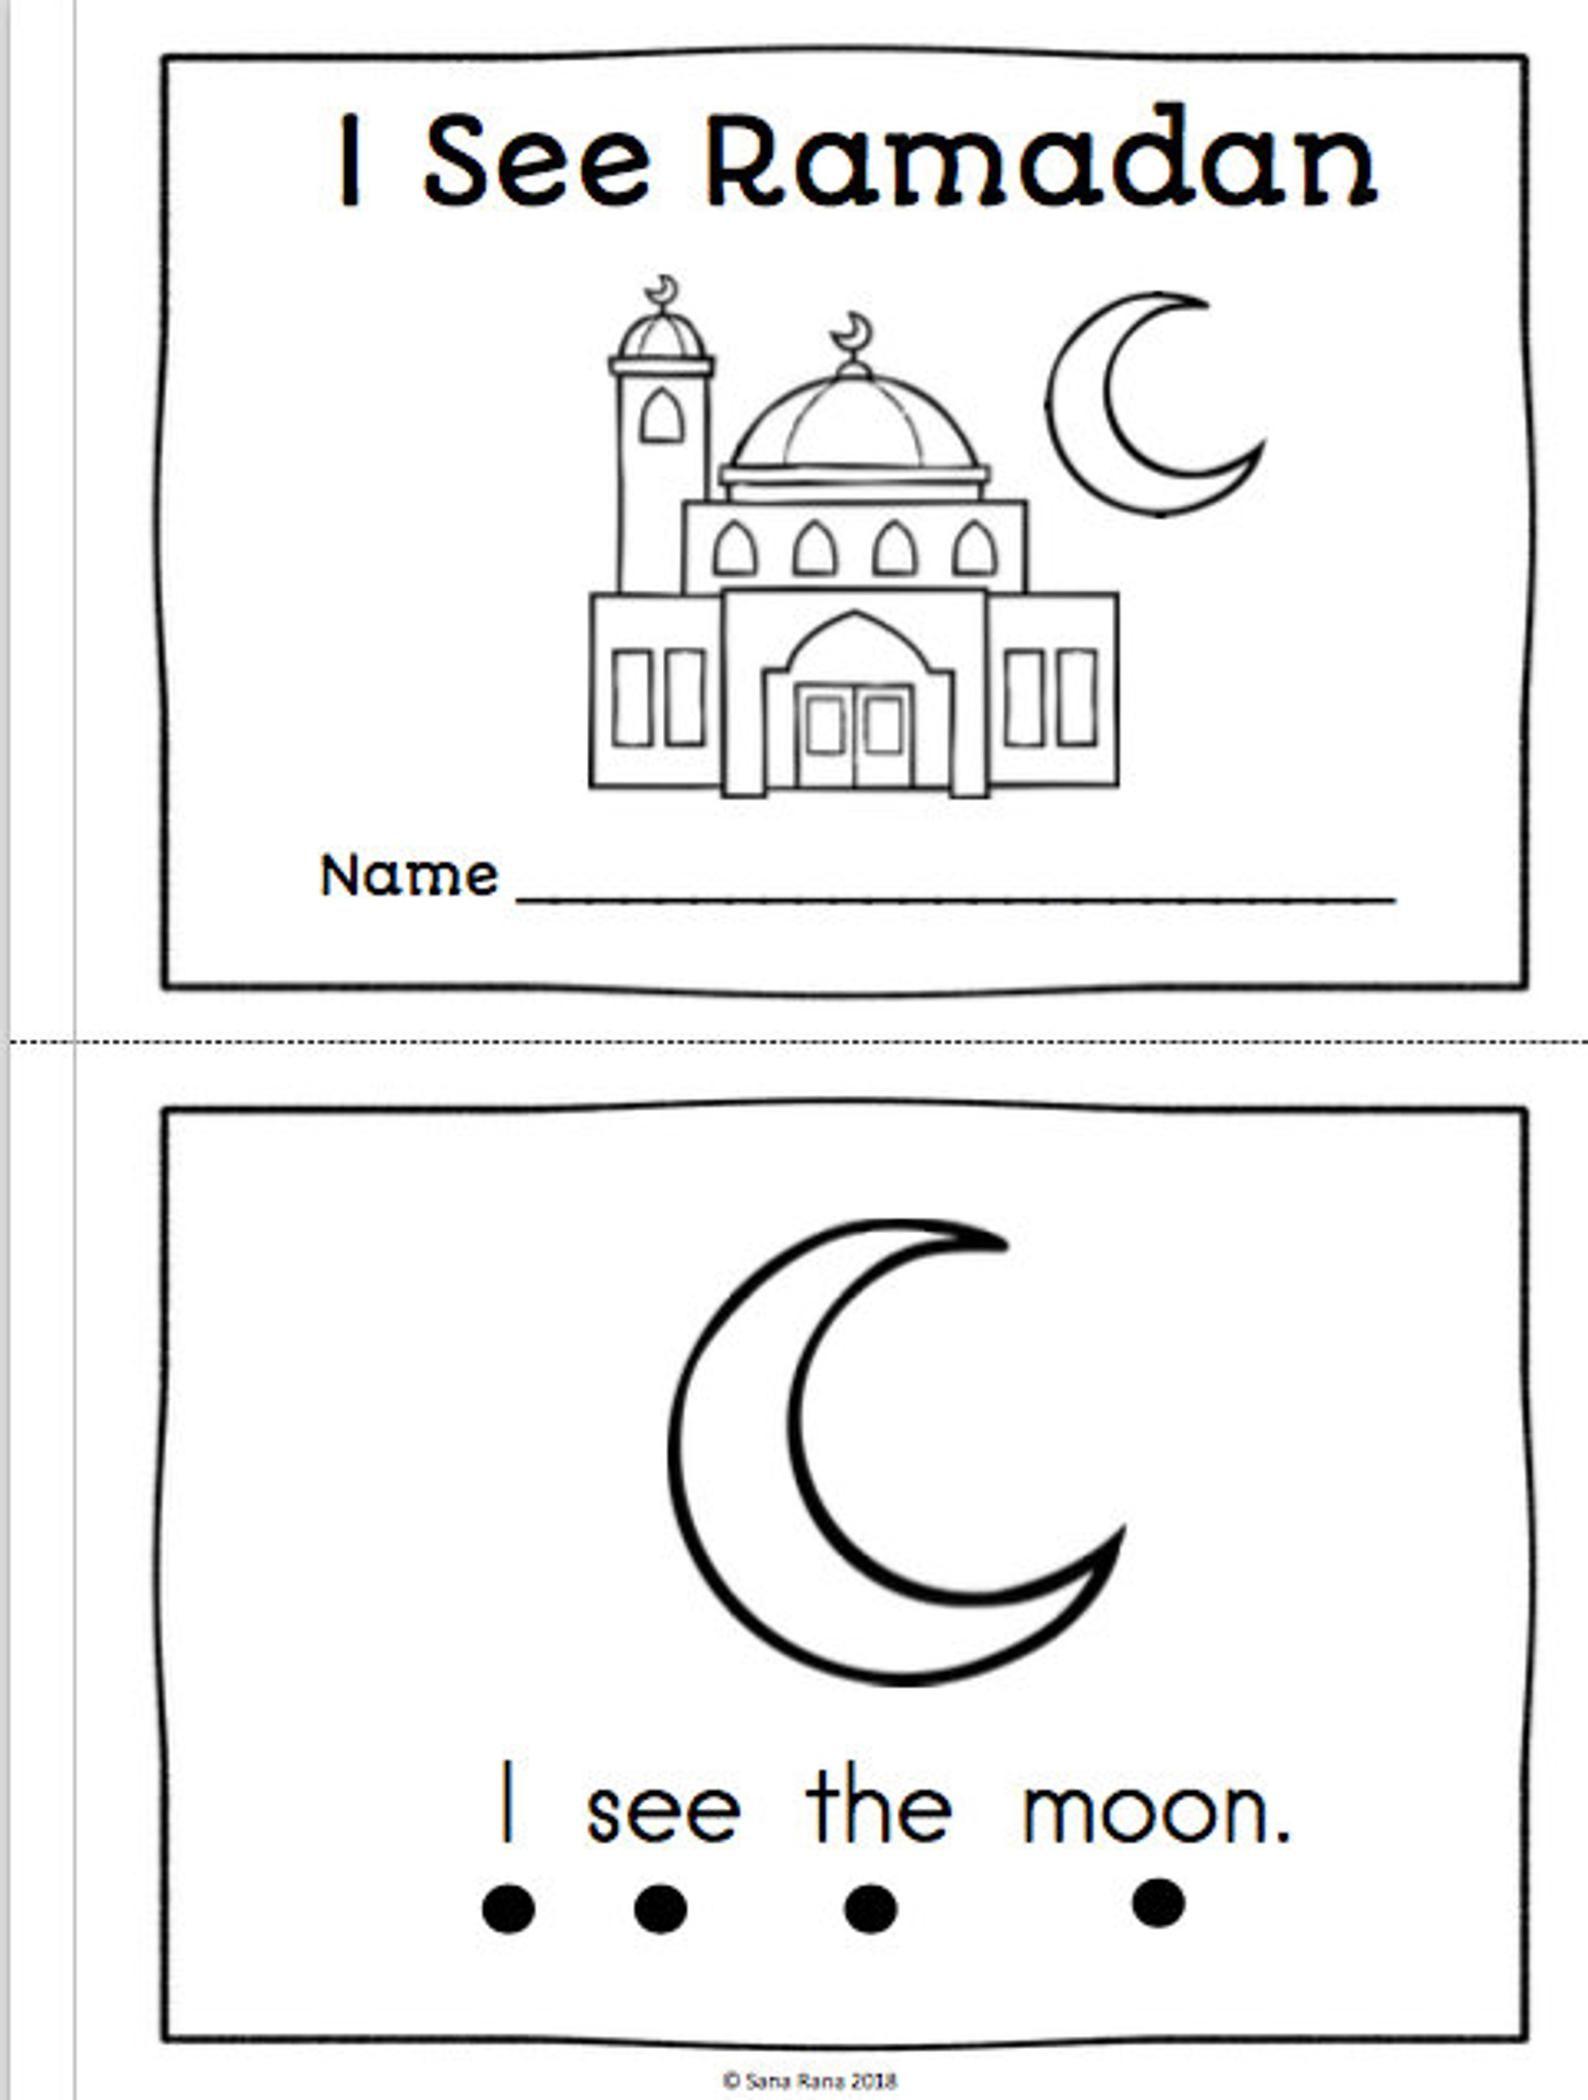 Ramadan Activity Pack Worksheet Printable Download In